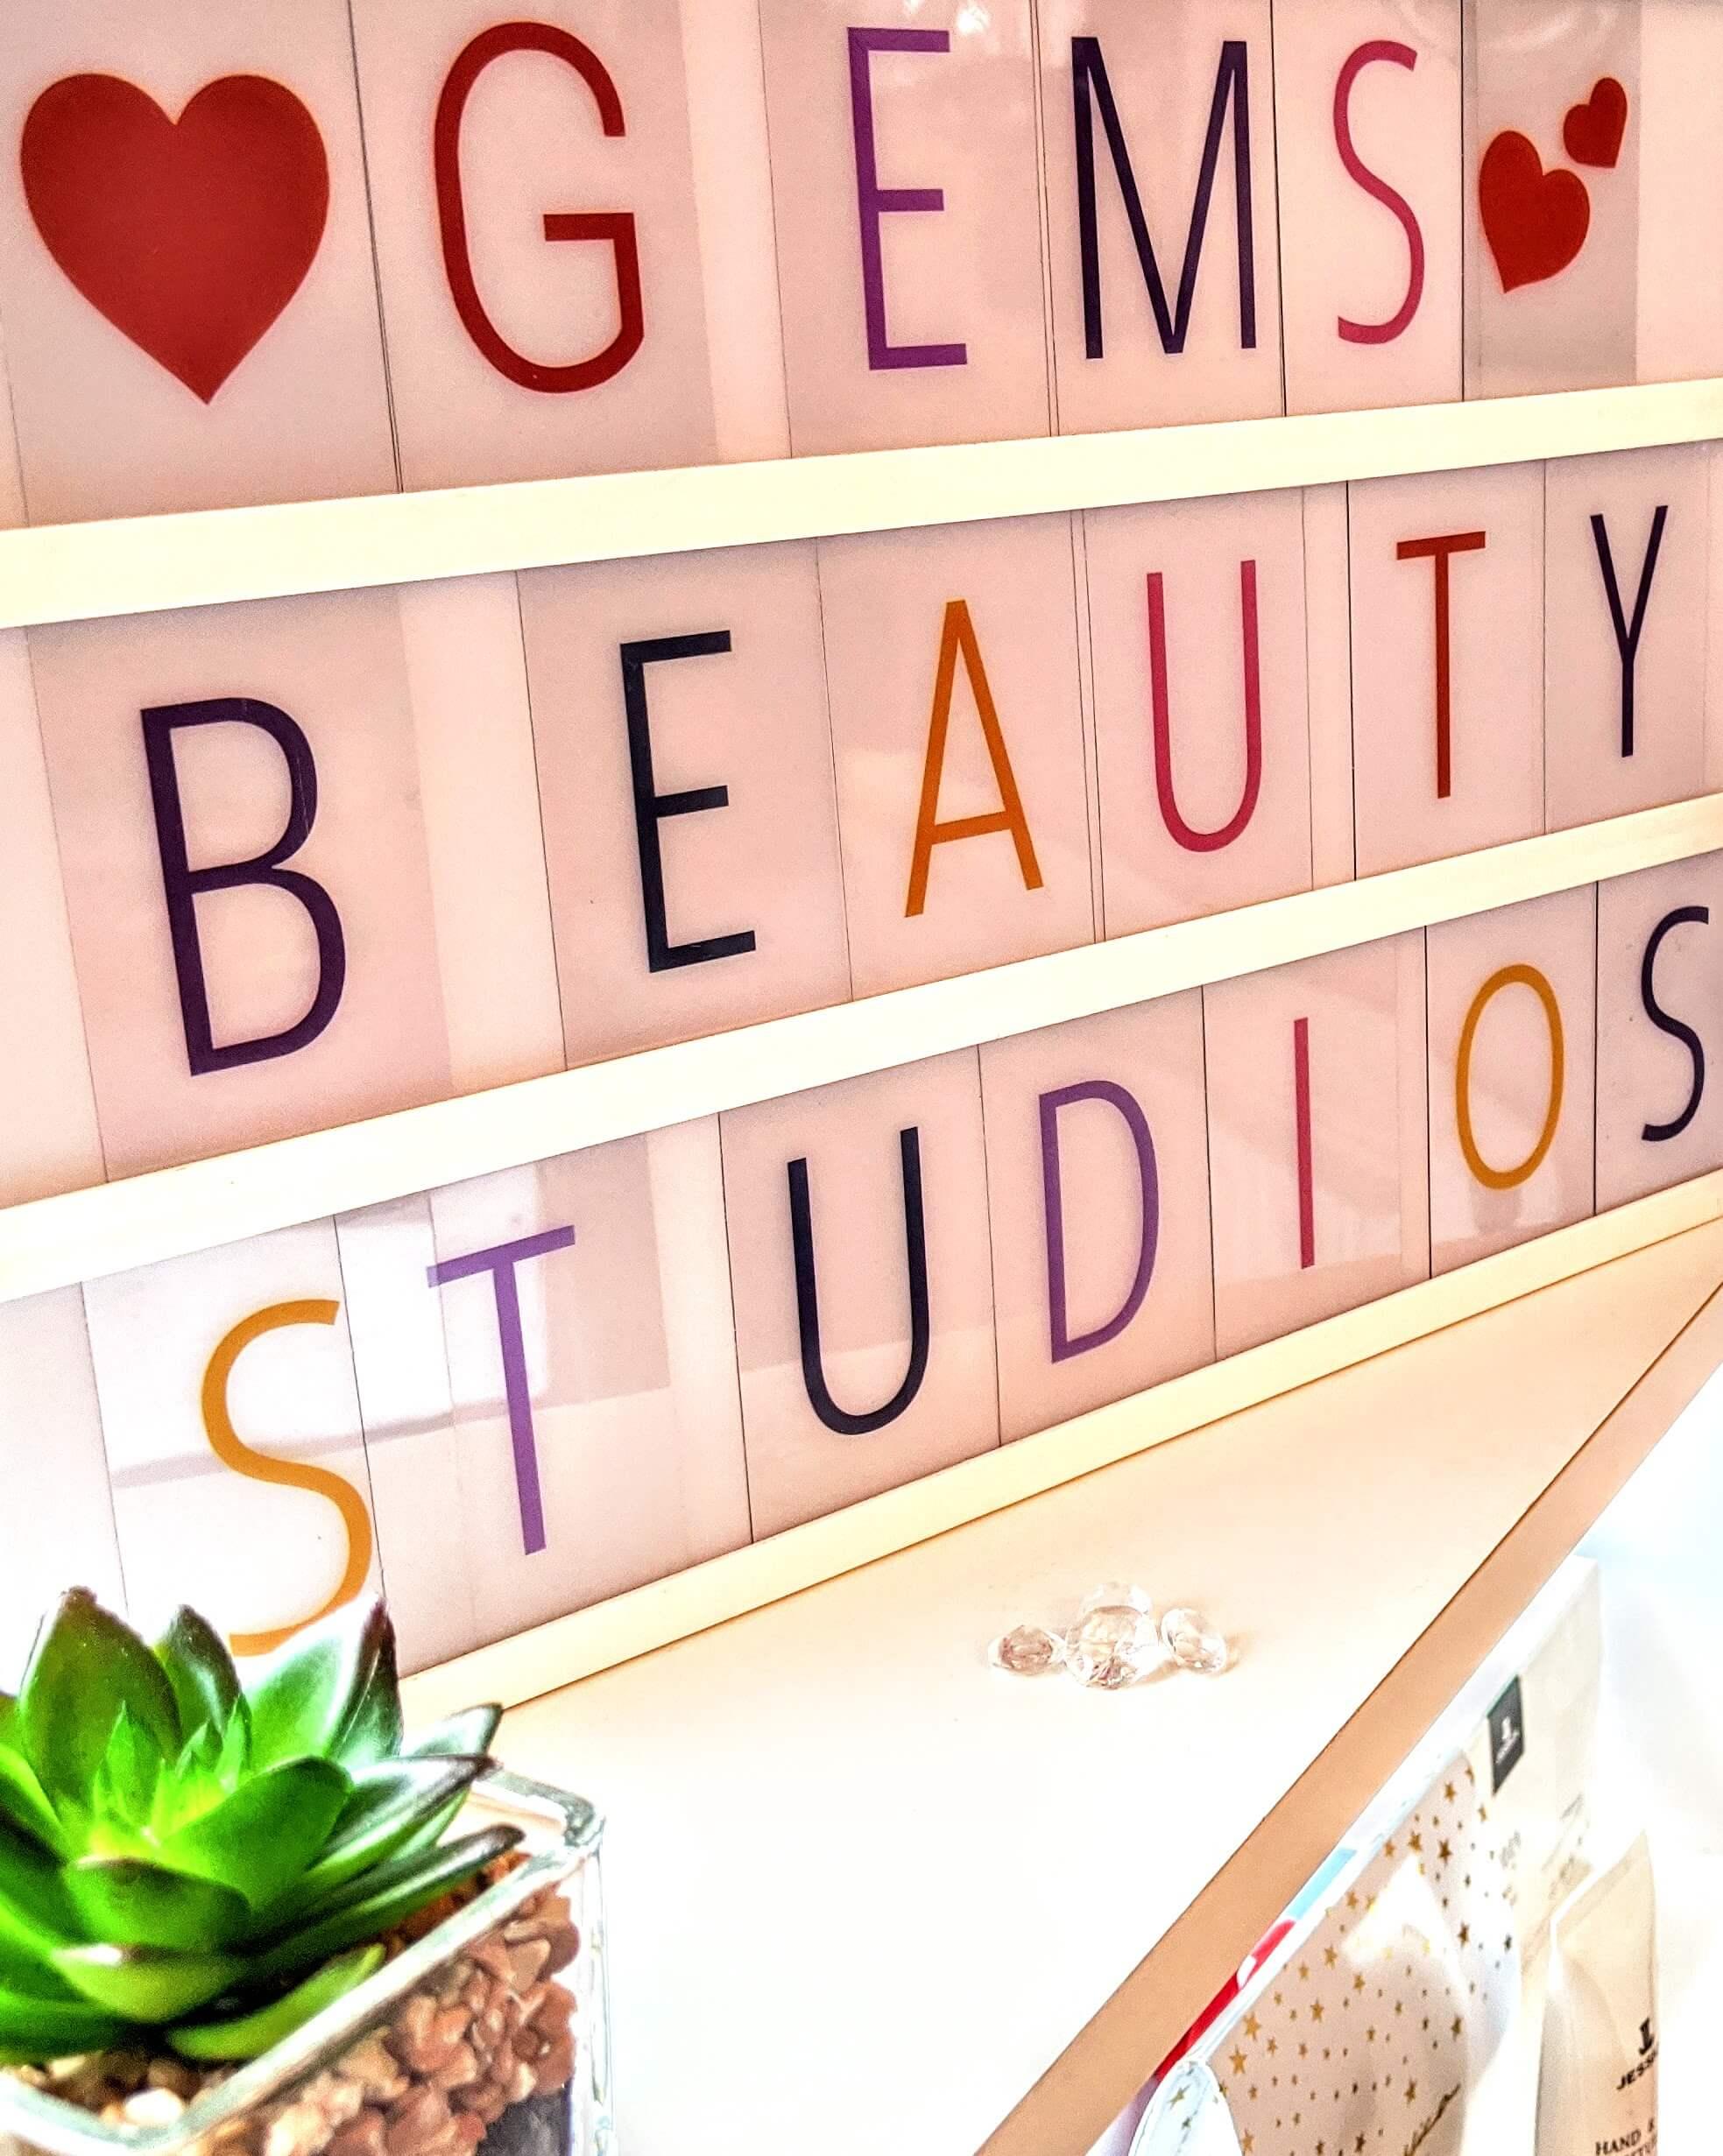 Gems Beauty Barnsley